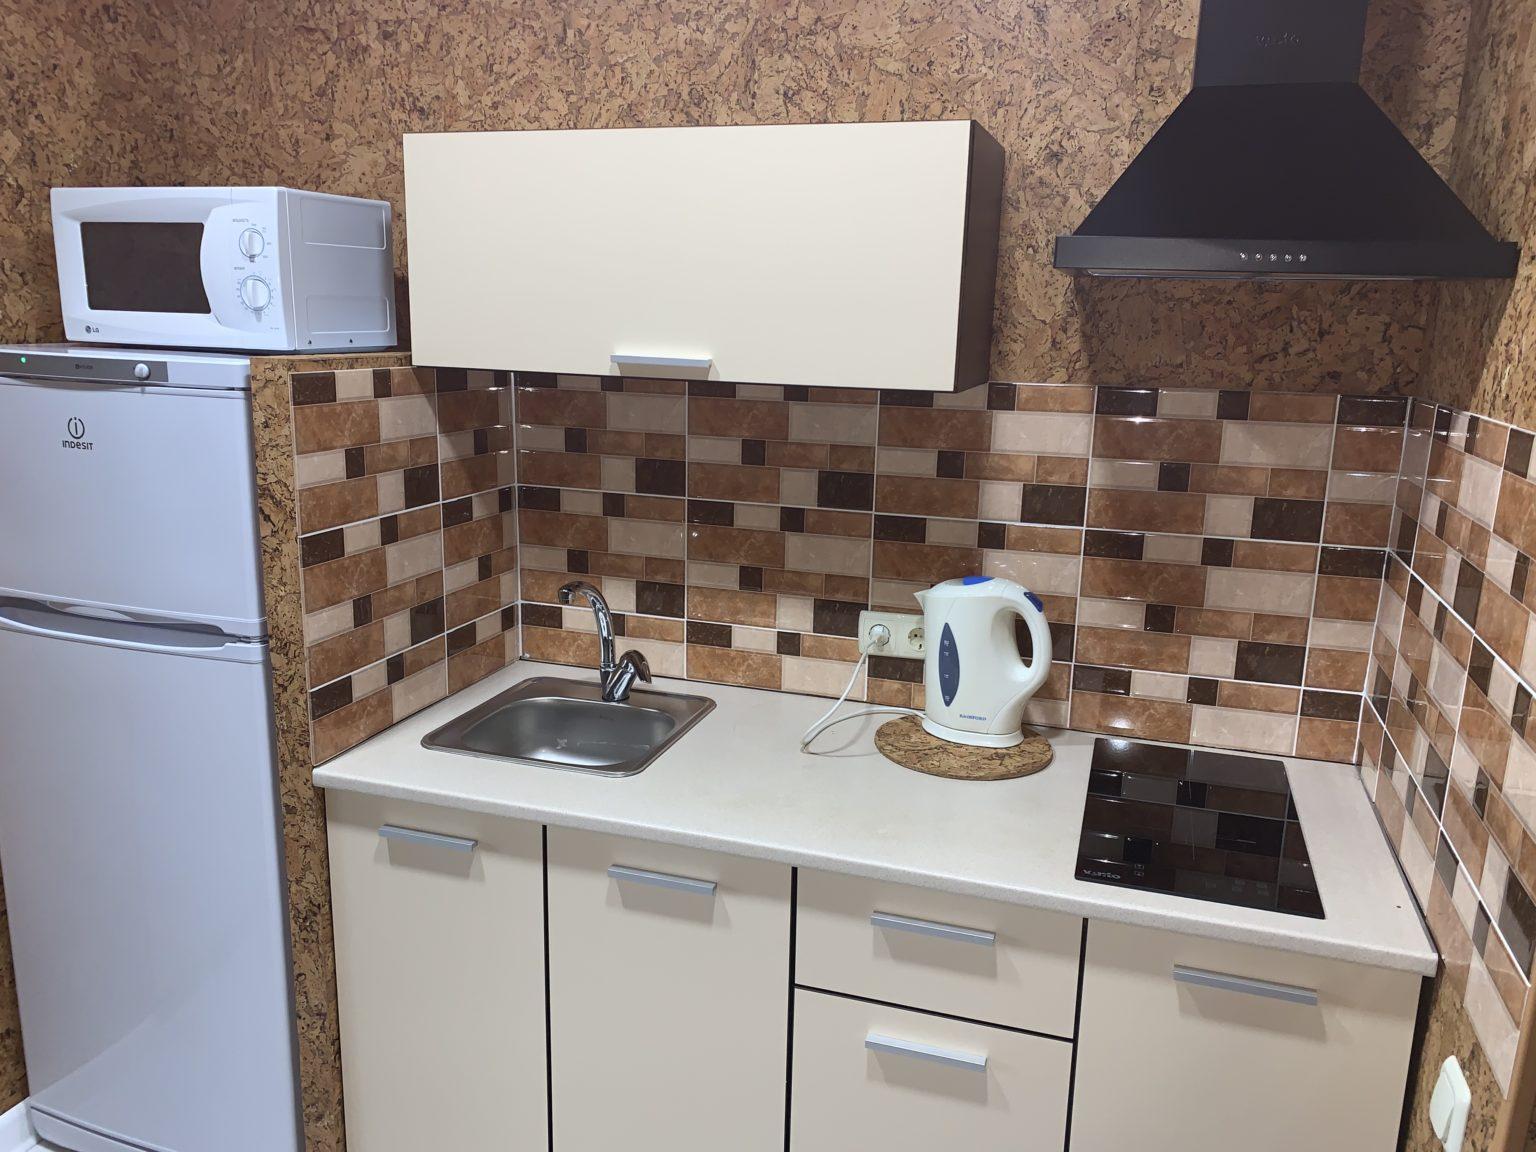 5-местный однокомнатный люкс. Кухня